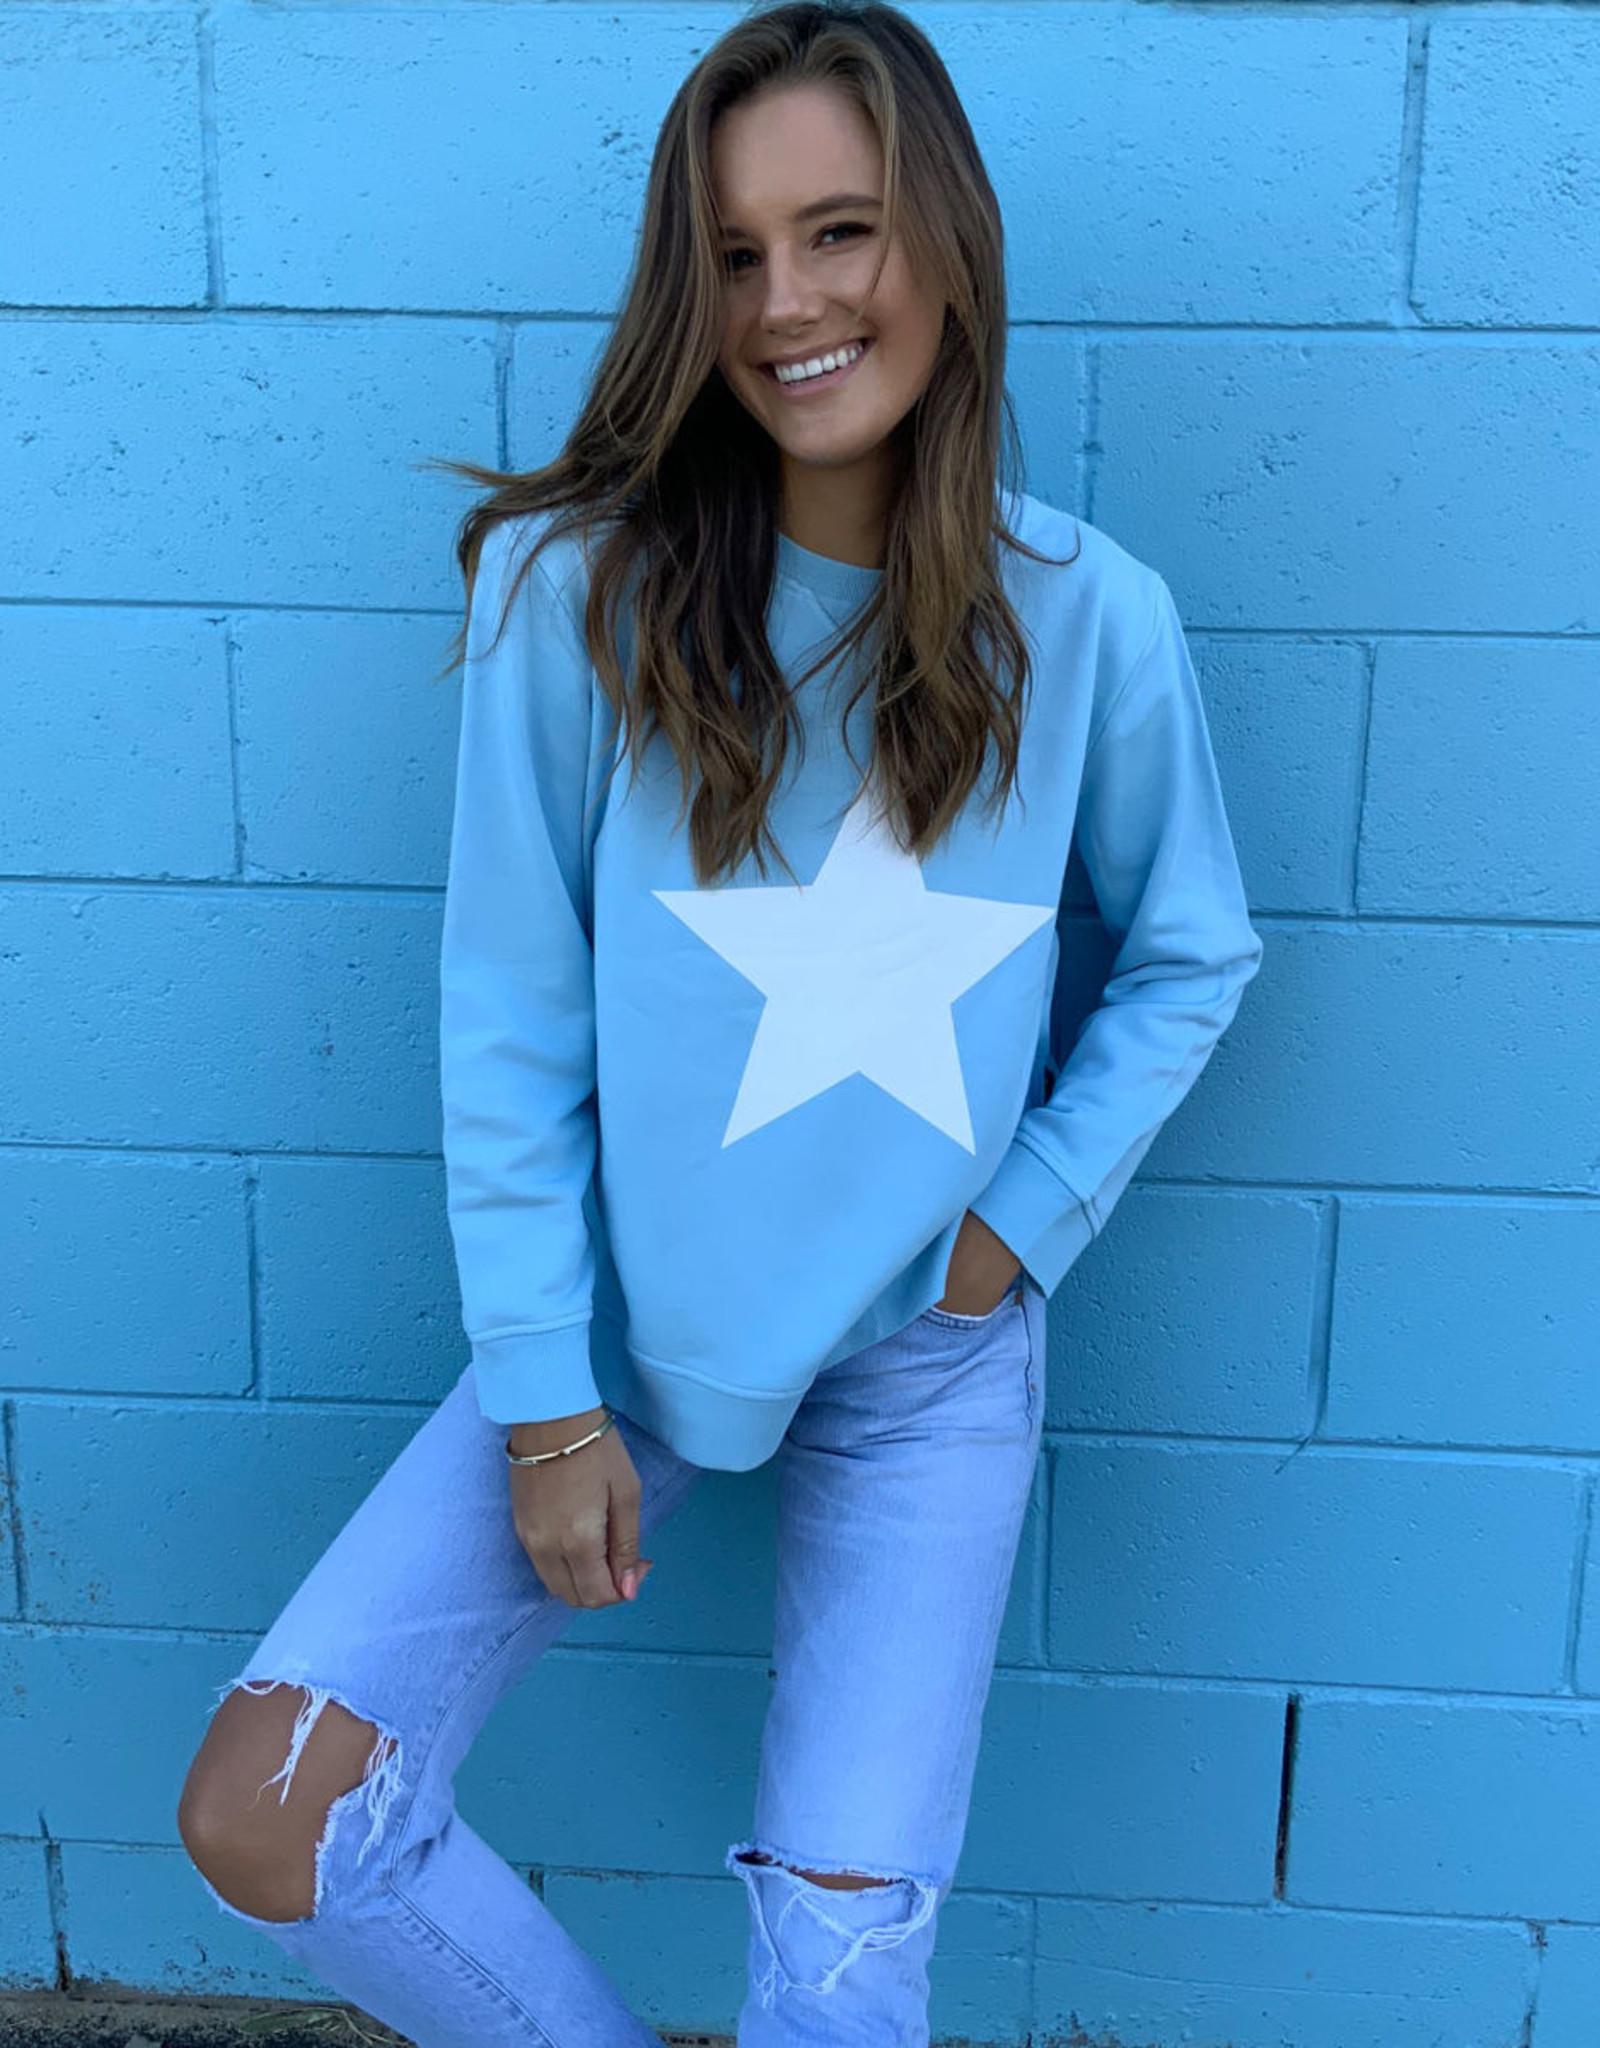 SOPHIE MORAN ZIP STAR SWEATSHIRT BABY BLUE & WHITE